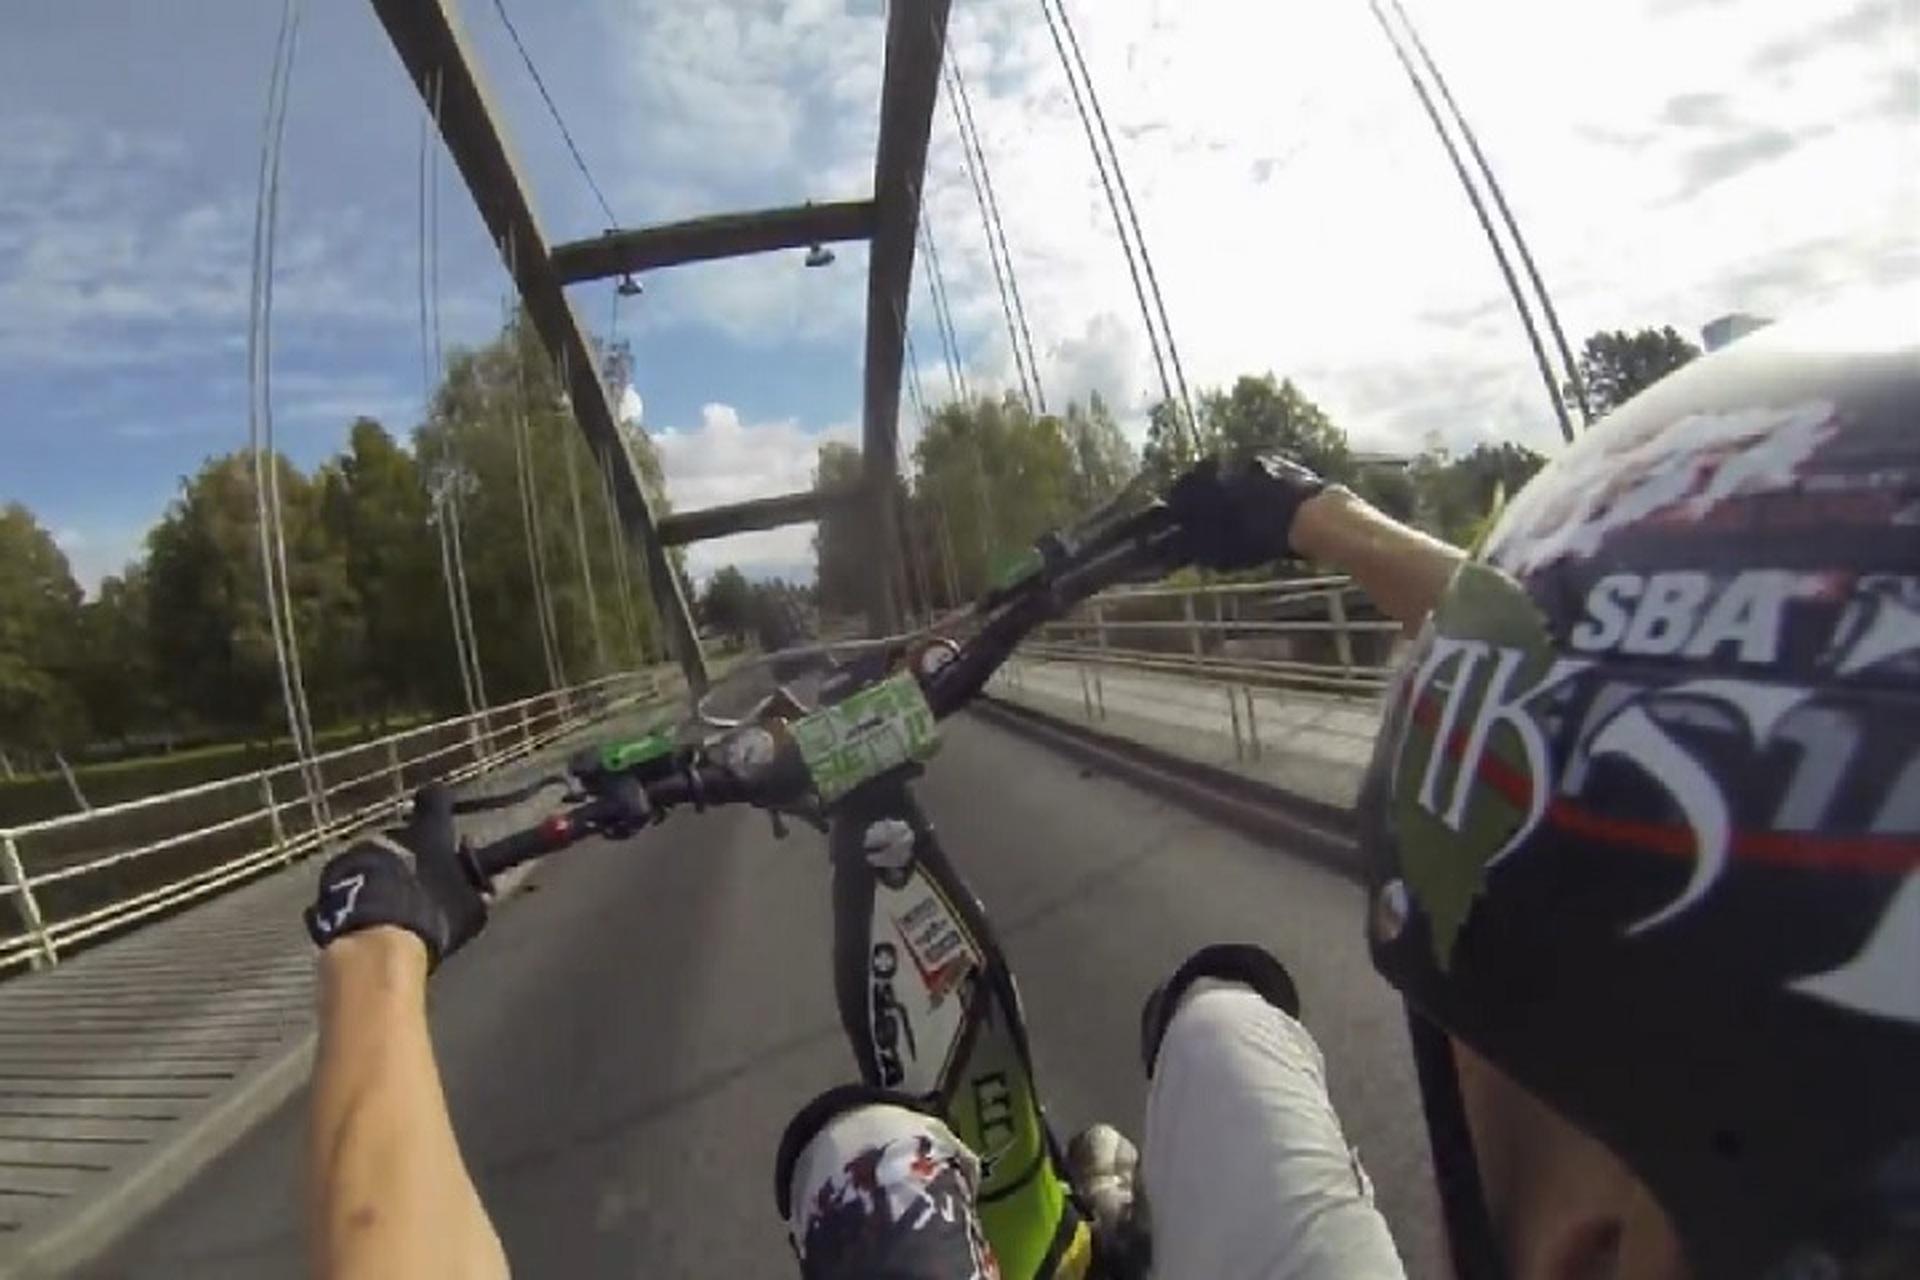 Watch This Insane Cyclist Ride Across a Bridge Arch